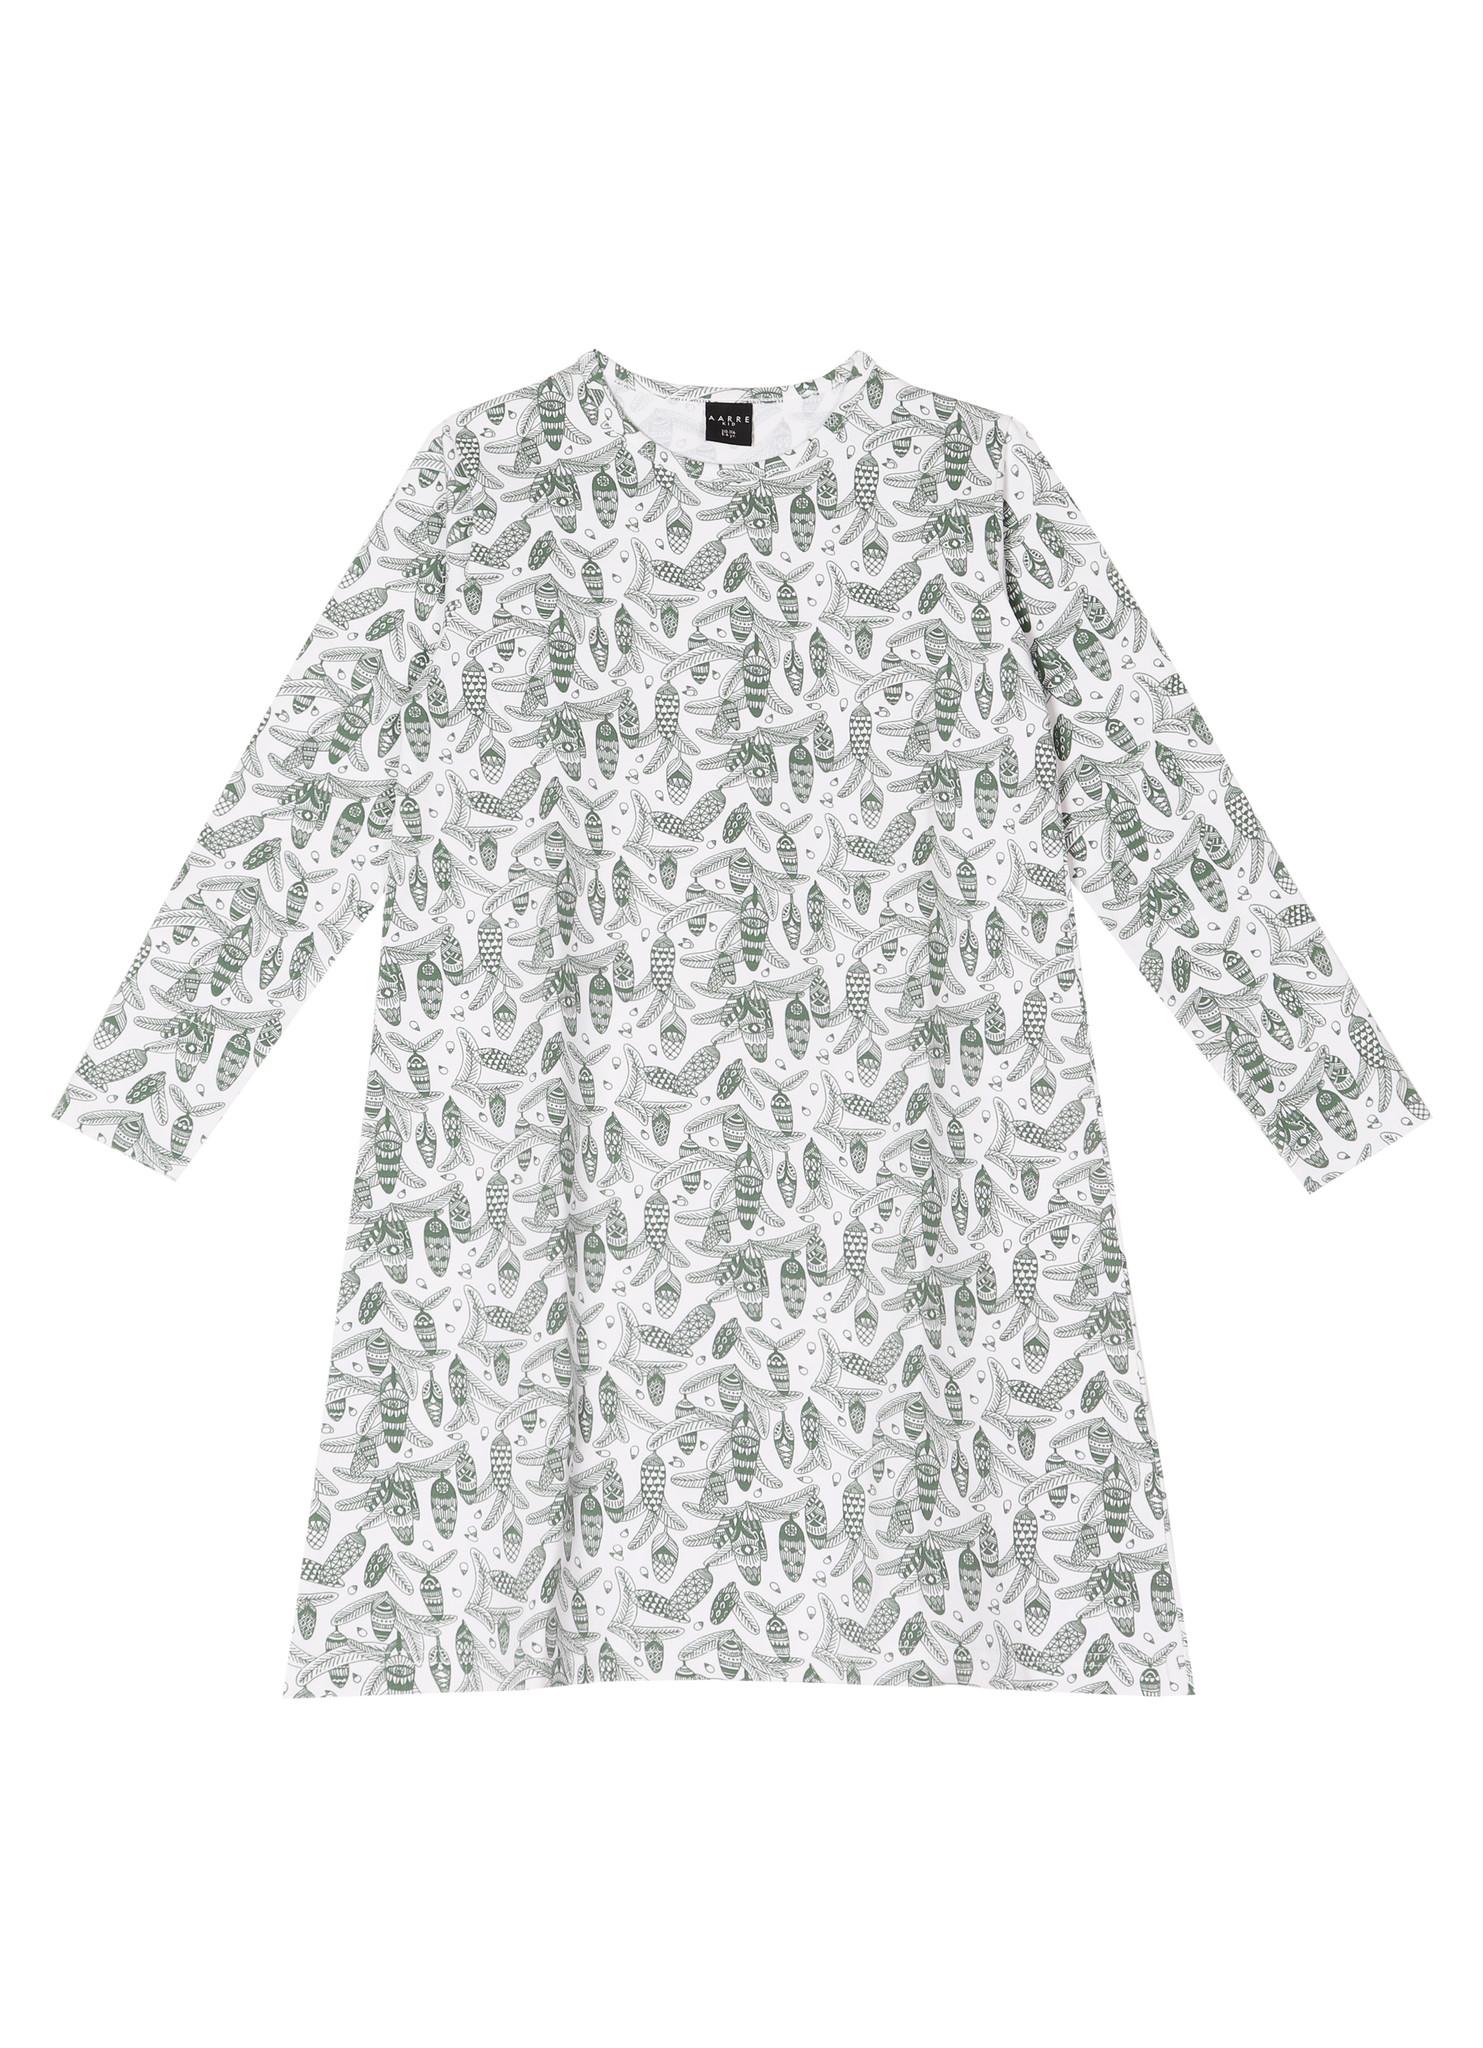 "Nightgown ""Pine"" black/white"